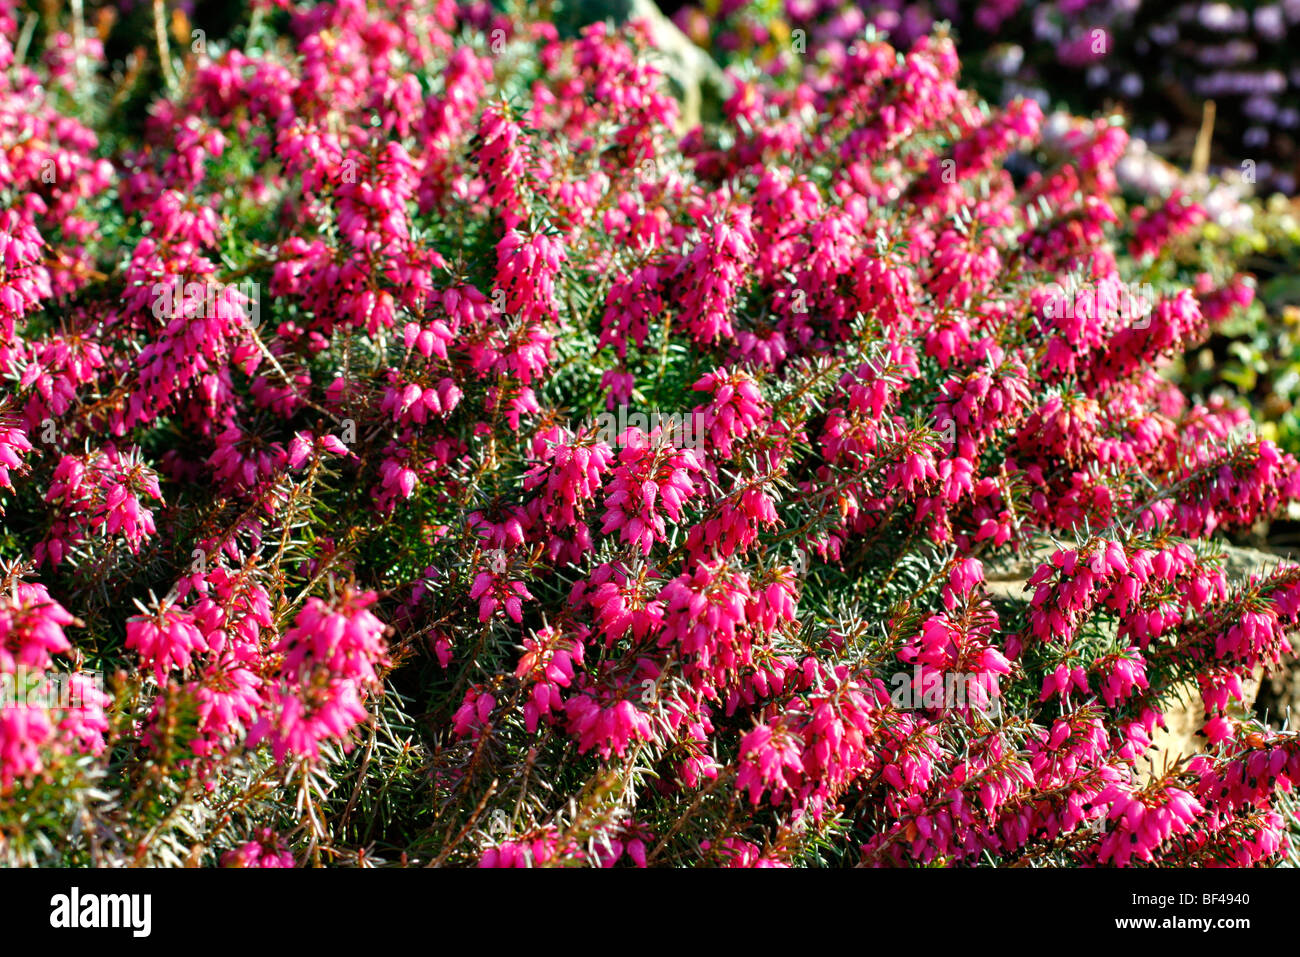 Erica carnea 'Myretoun Ruby' - Stock Image